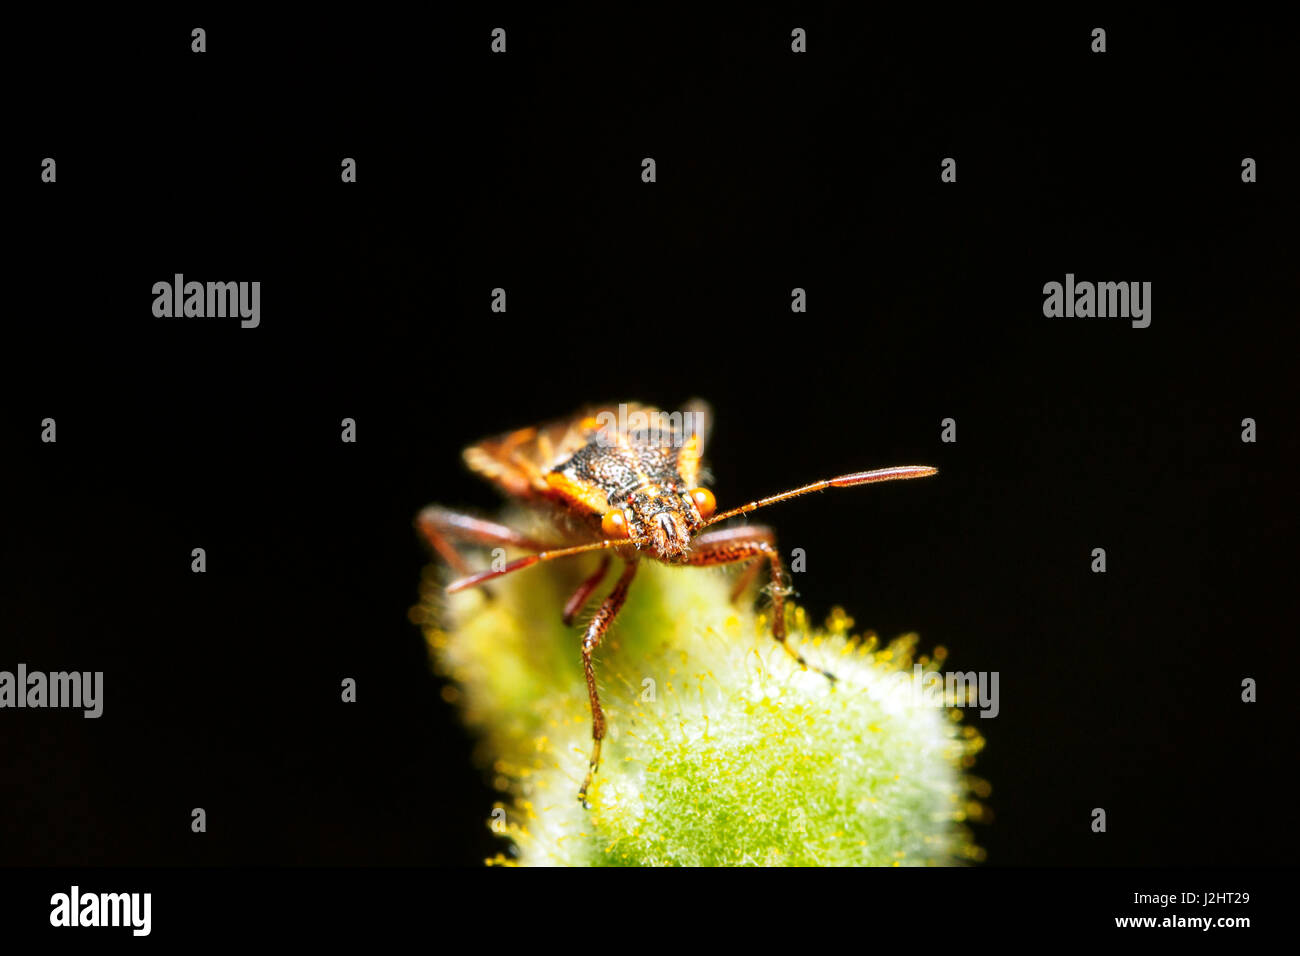 Rhopalus parumpunctatus - Stock Image